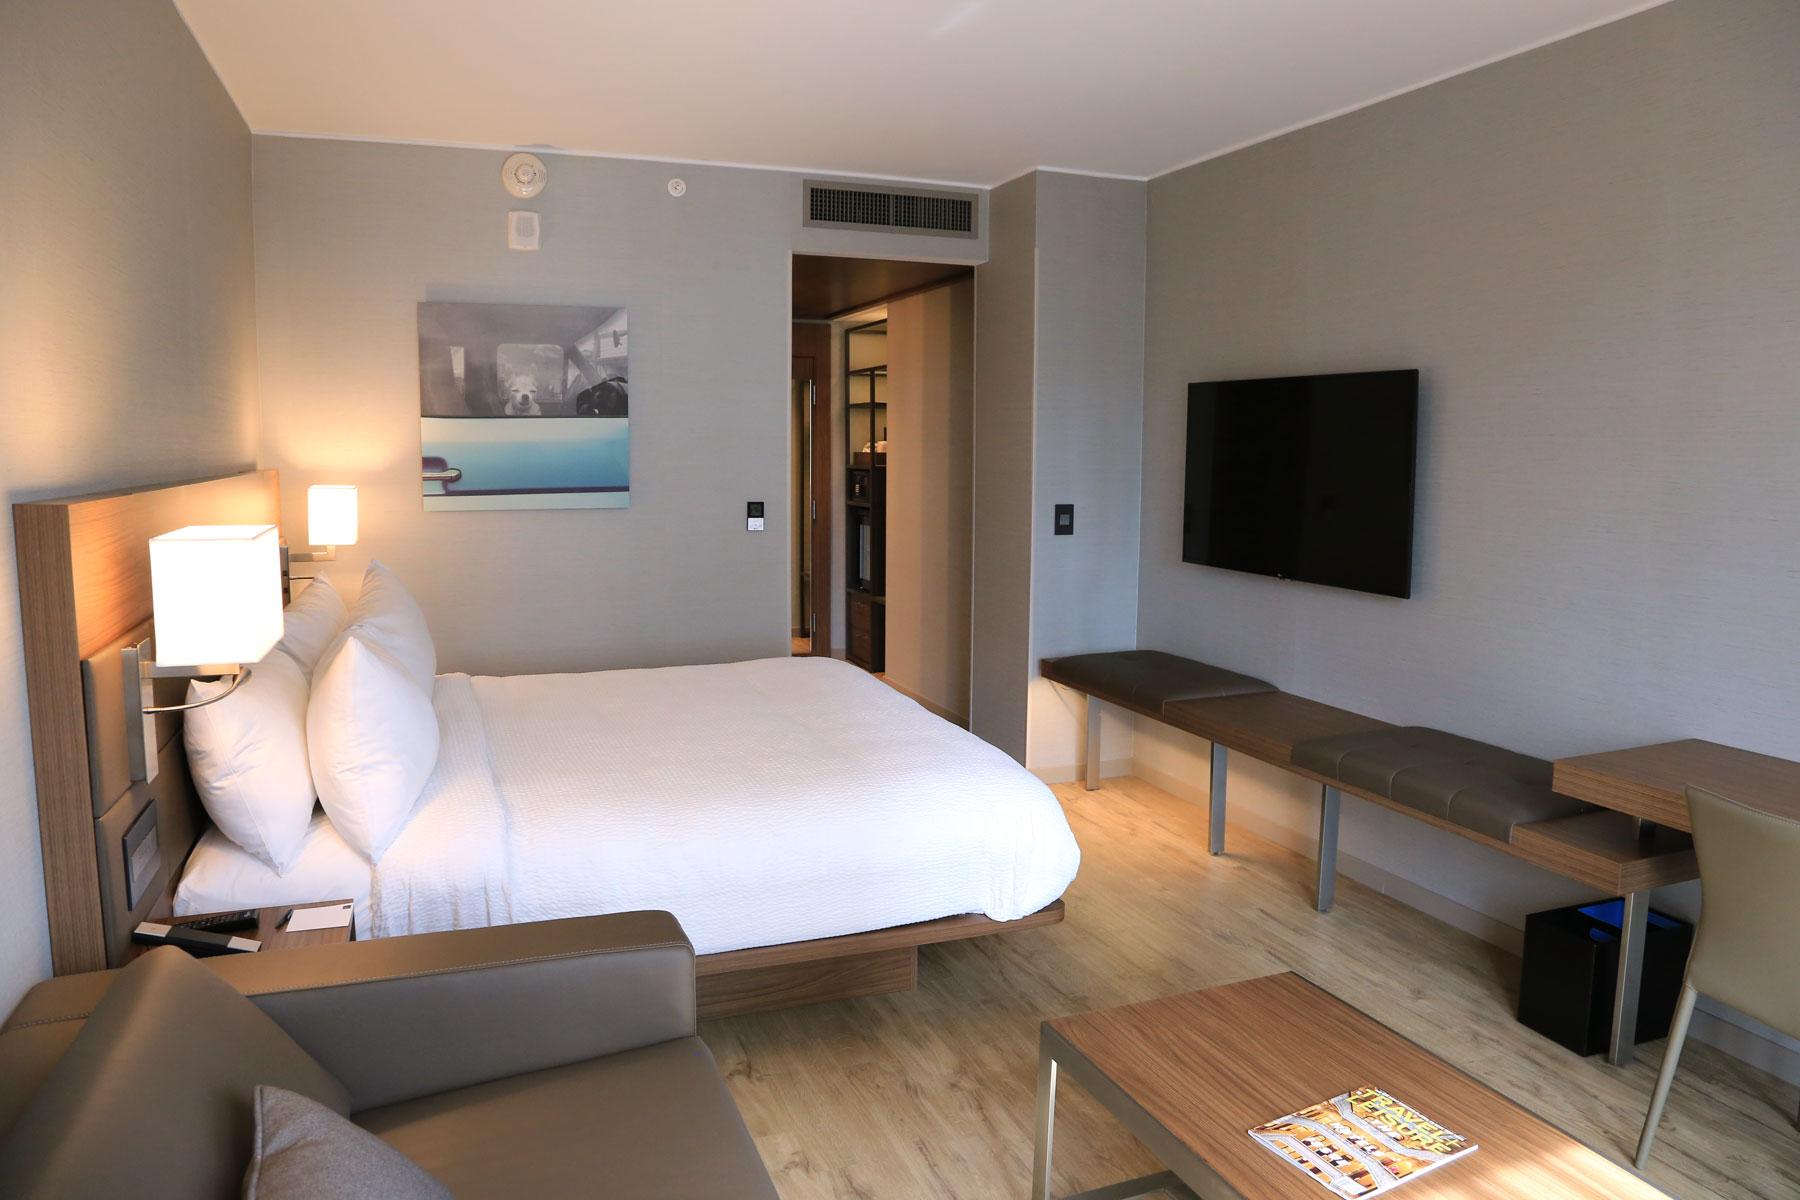 Marriott AC Hotel | ABD Engineering & Design